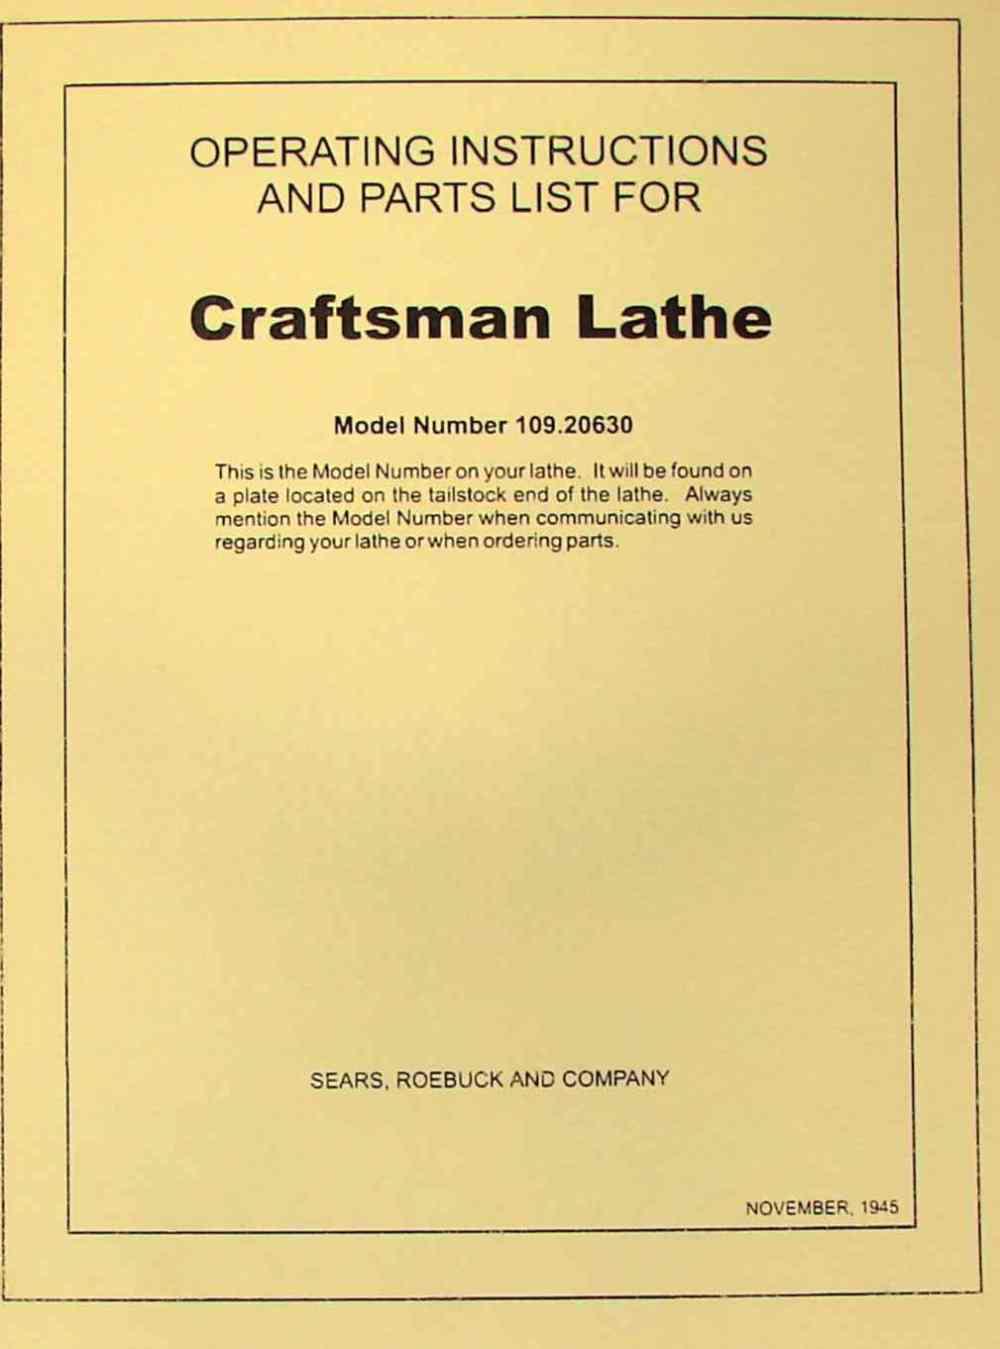 medium resolution of craftsman dunlap 6 metal lathe 109 20630 instructions parts manual